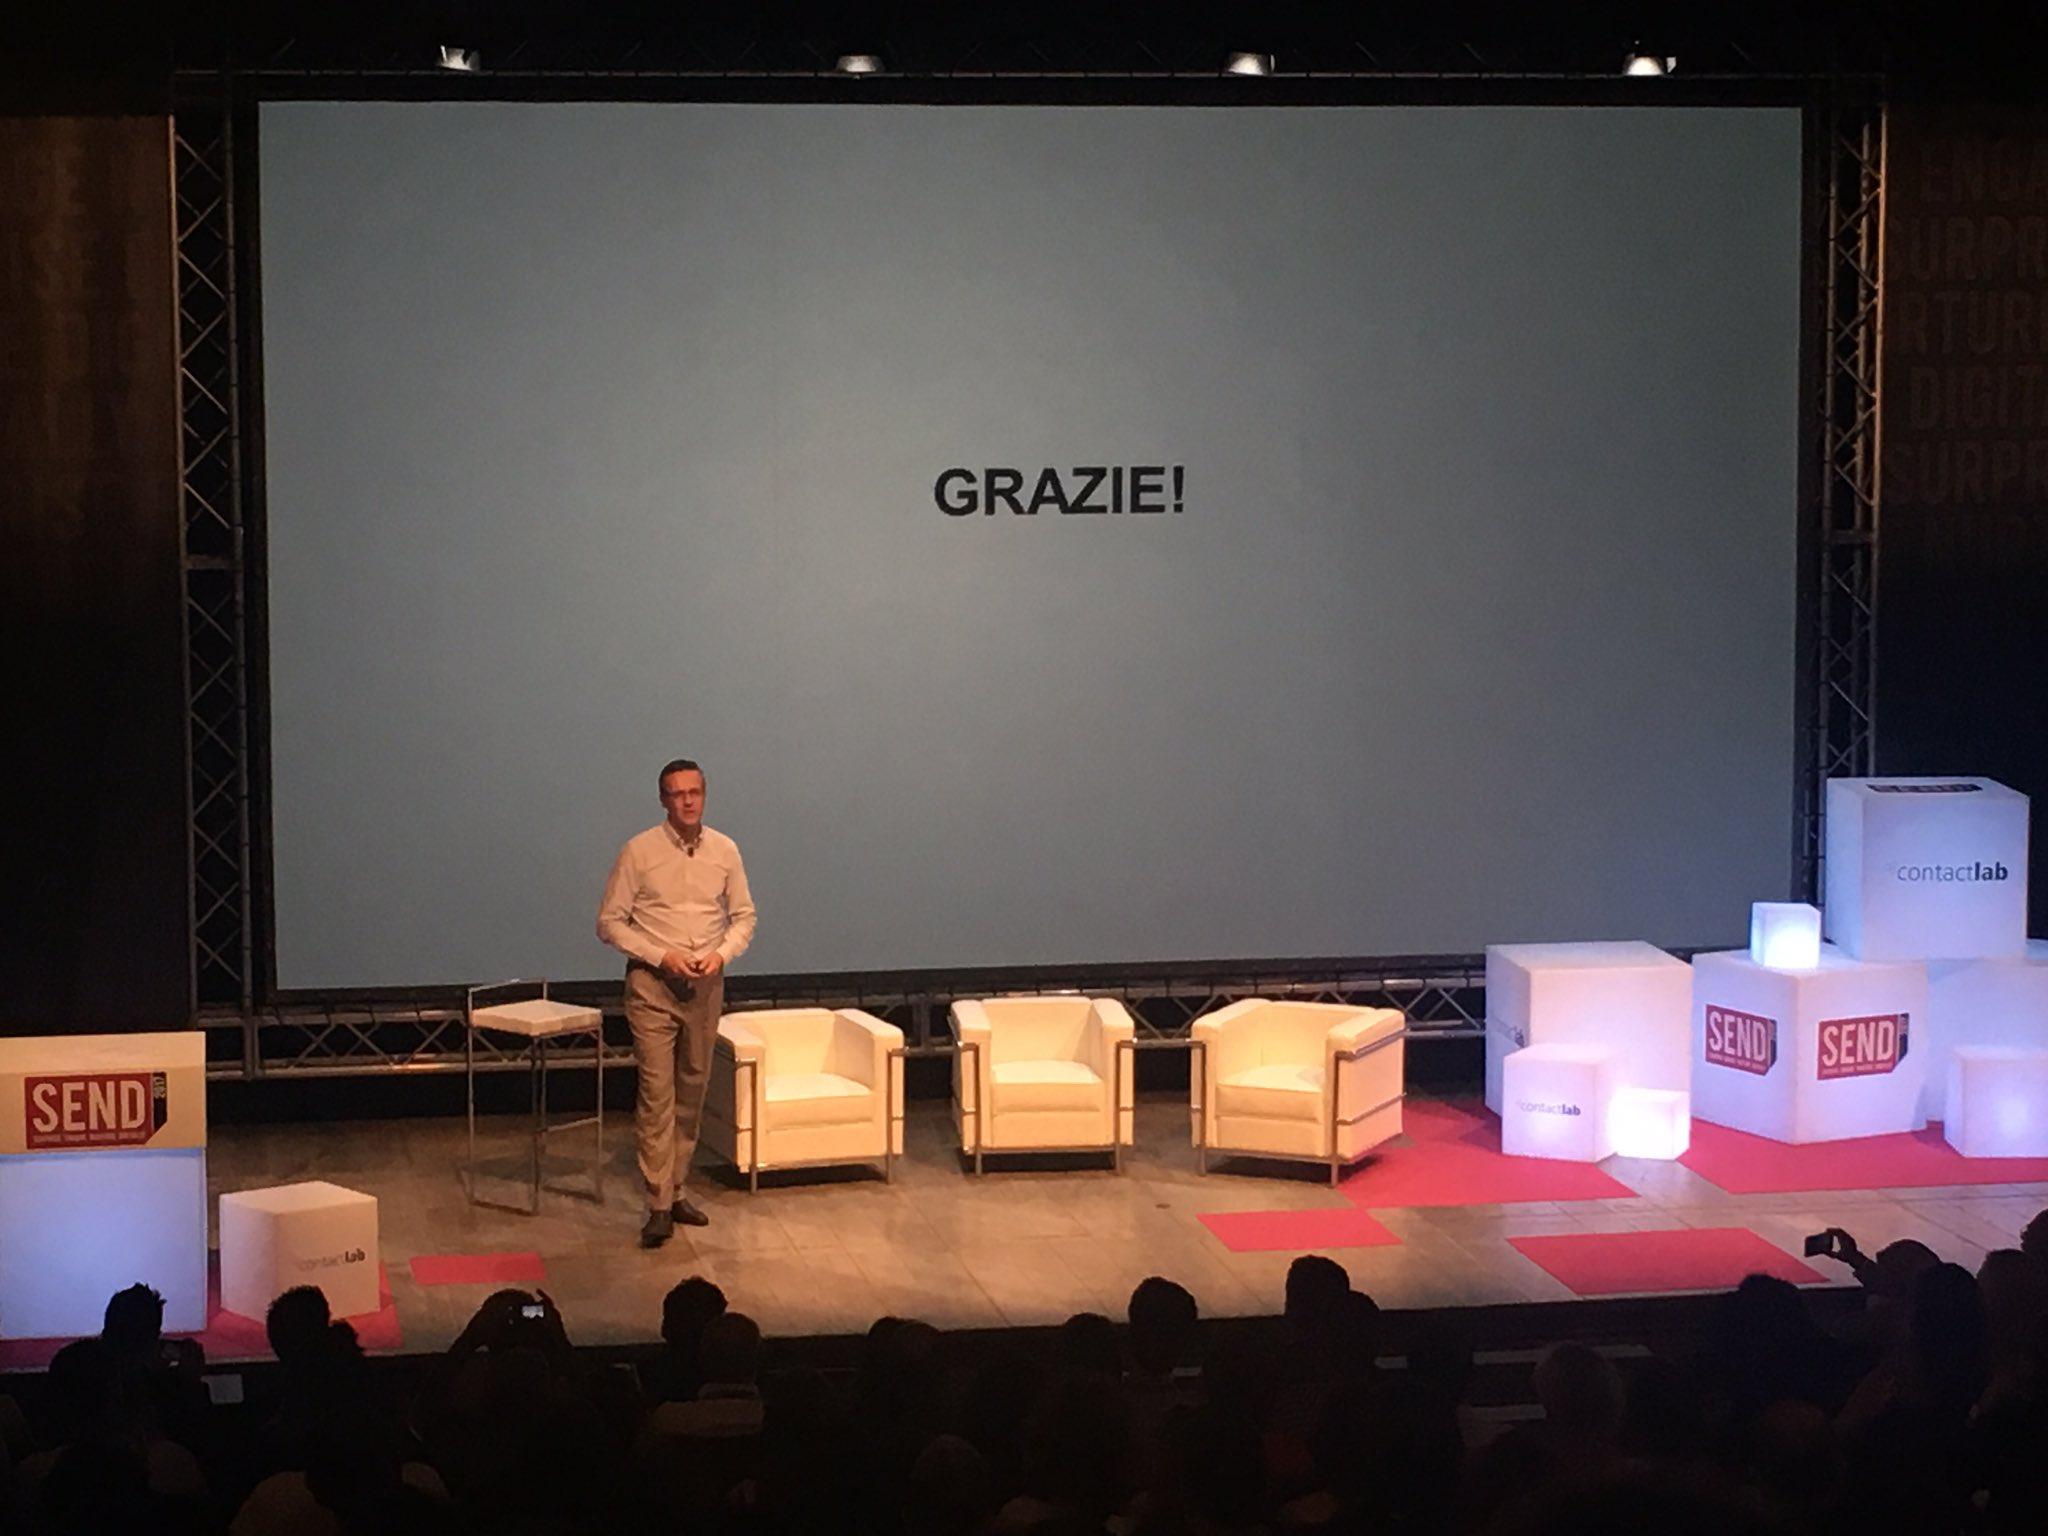 .@massimofubini apre il #SENDSummit17 al Teatro Franco Parenti di Milano https://t.co/tuEVTKut8u